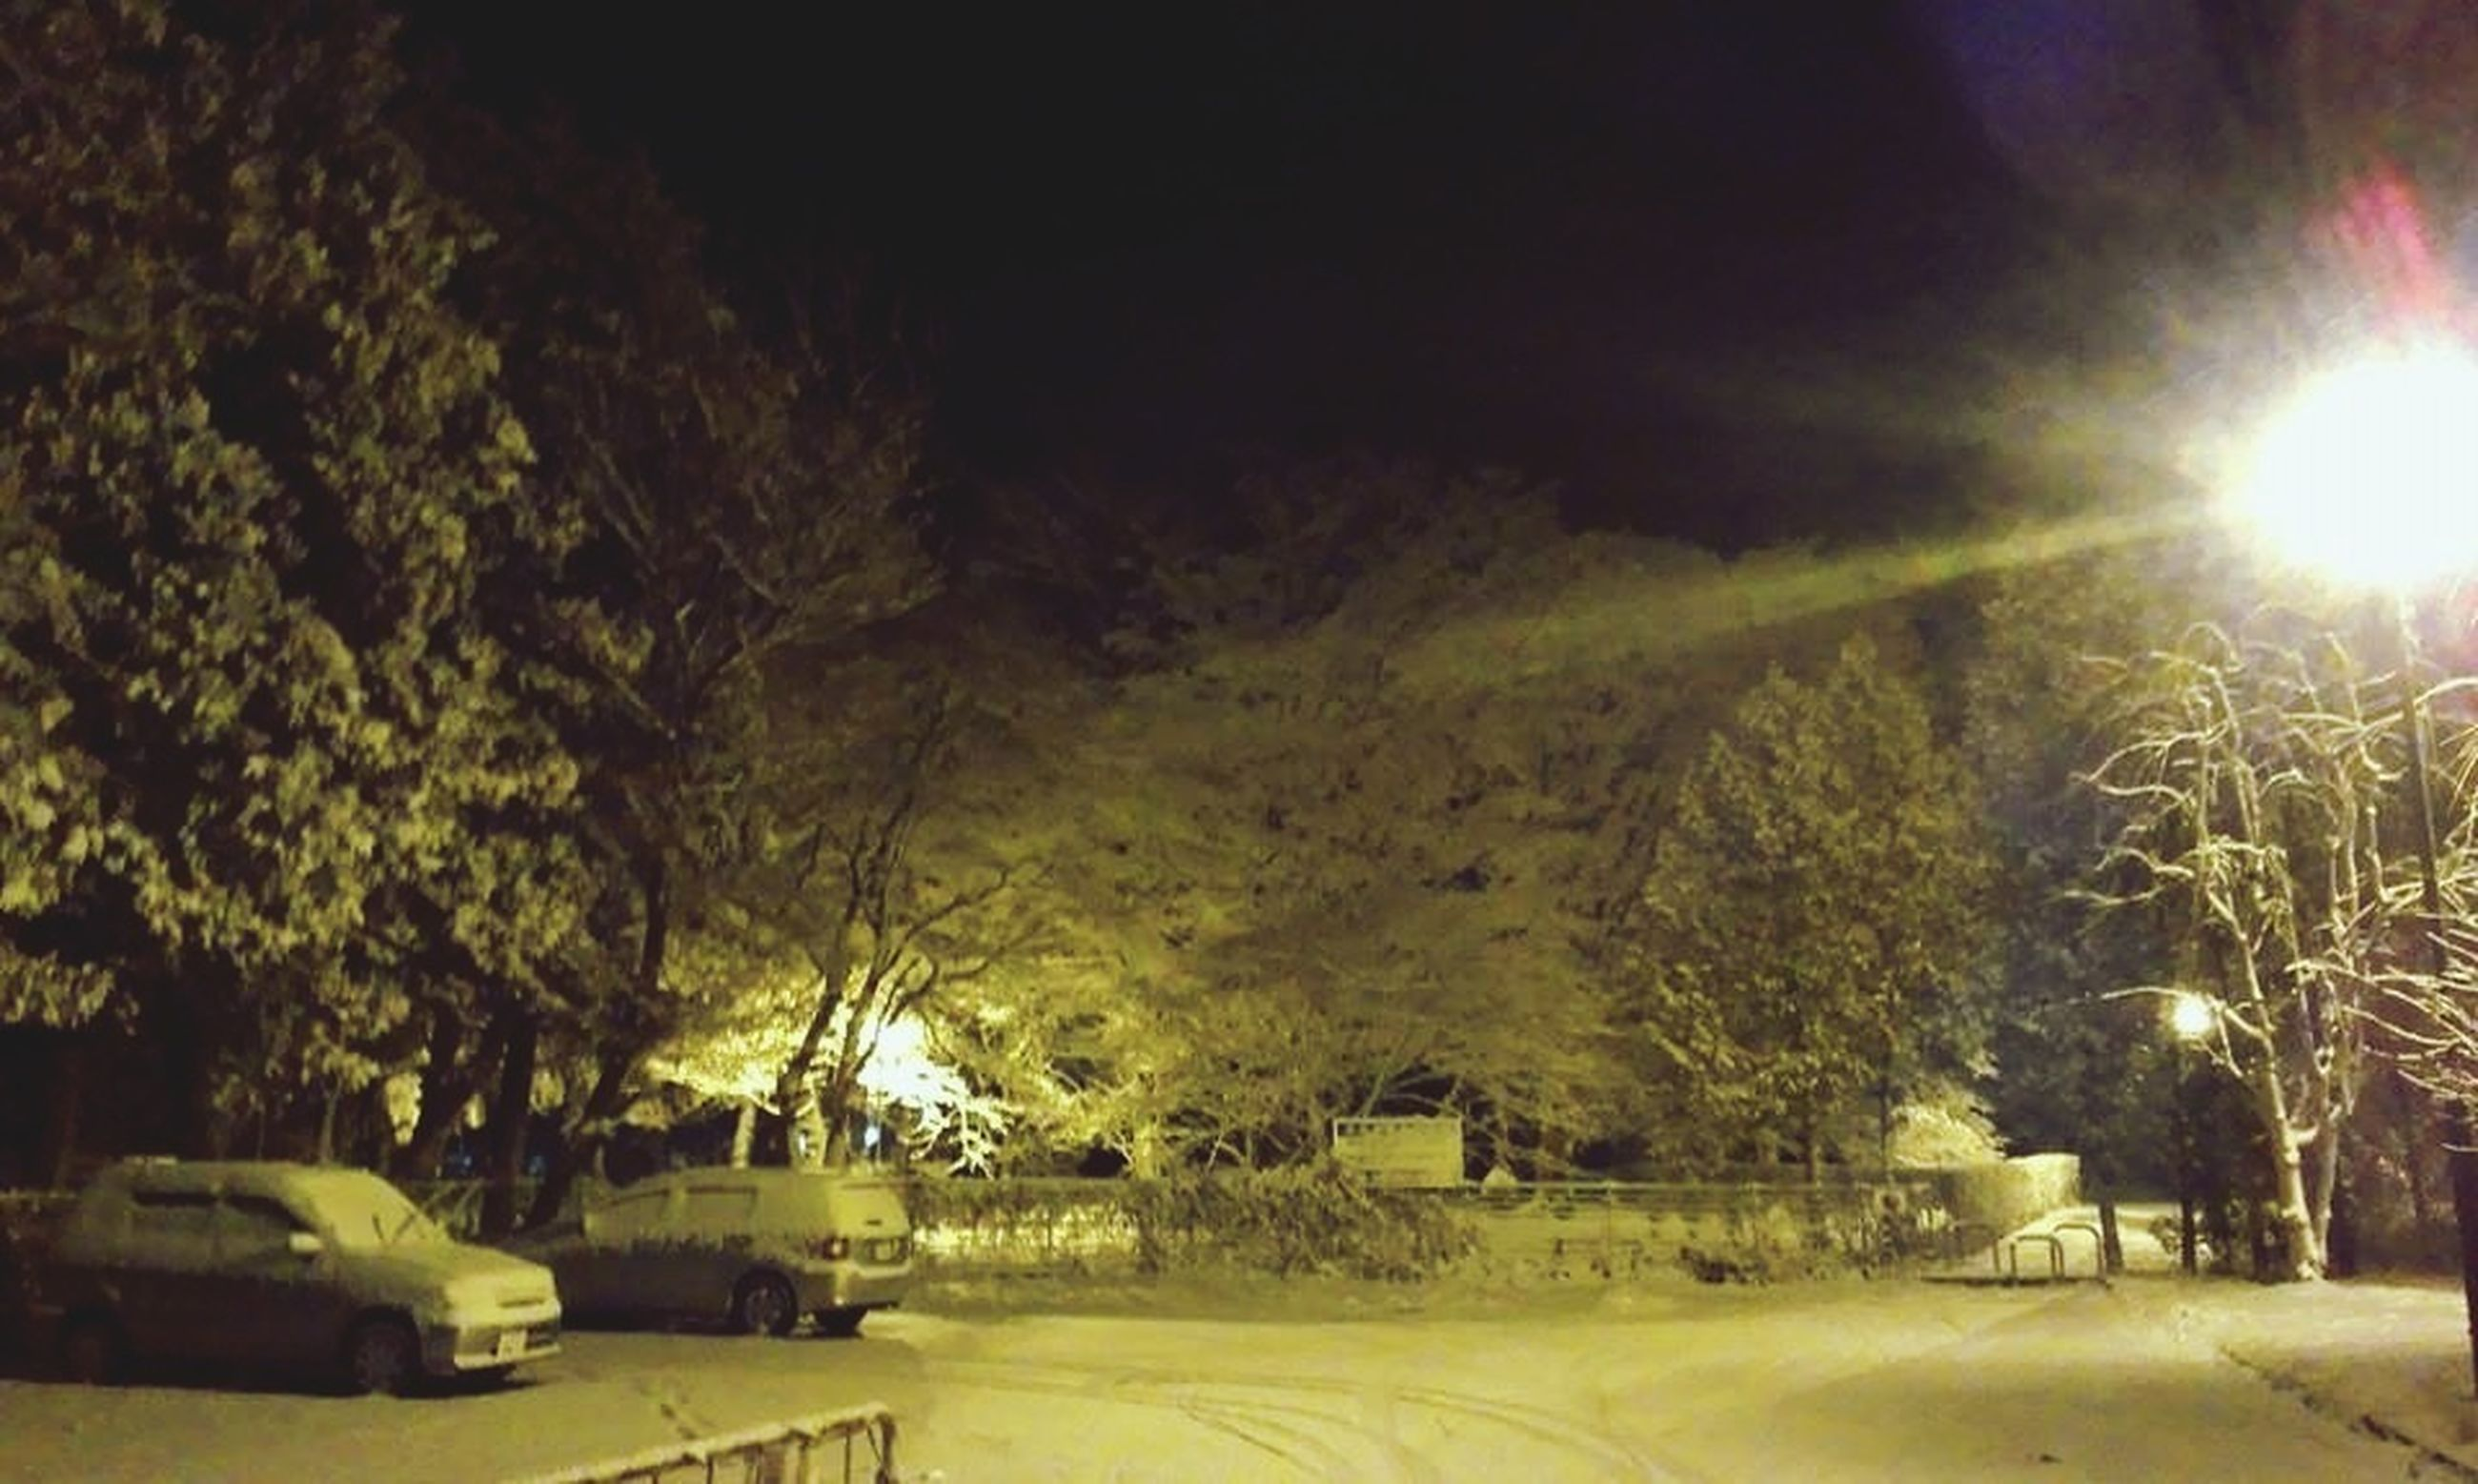 tree, building exterior, built structure, architecture, sunlight, lens flare, sun, sunbeam, house, growth, nature, street, road, car, sky, transportation, illuminated, outdoors, tranquility, street light